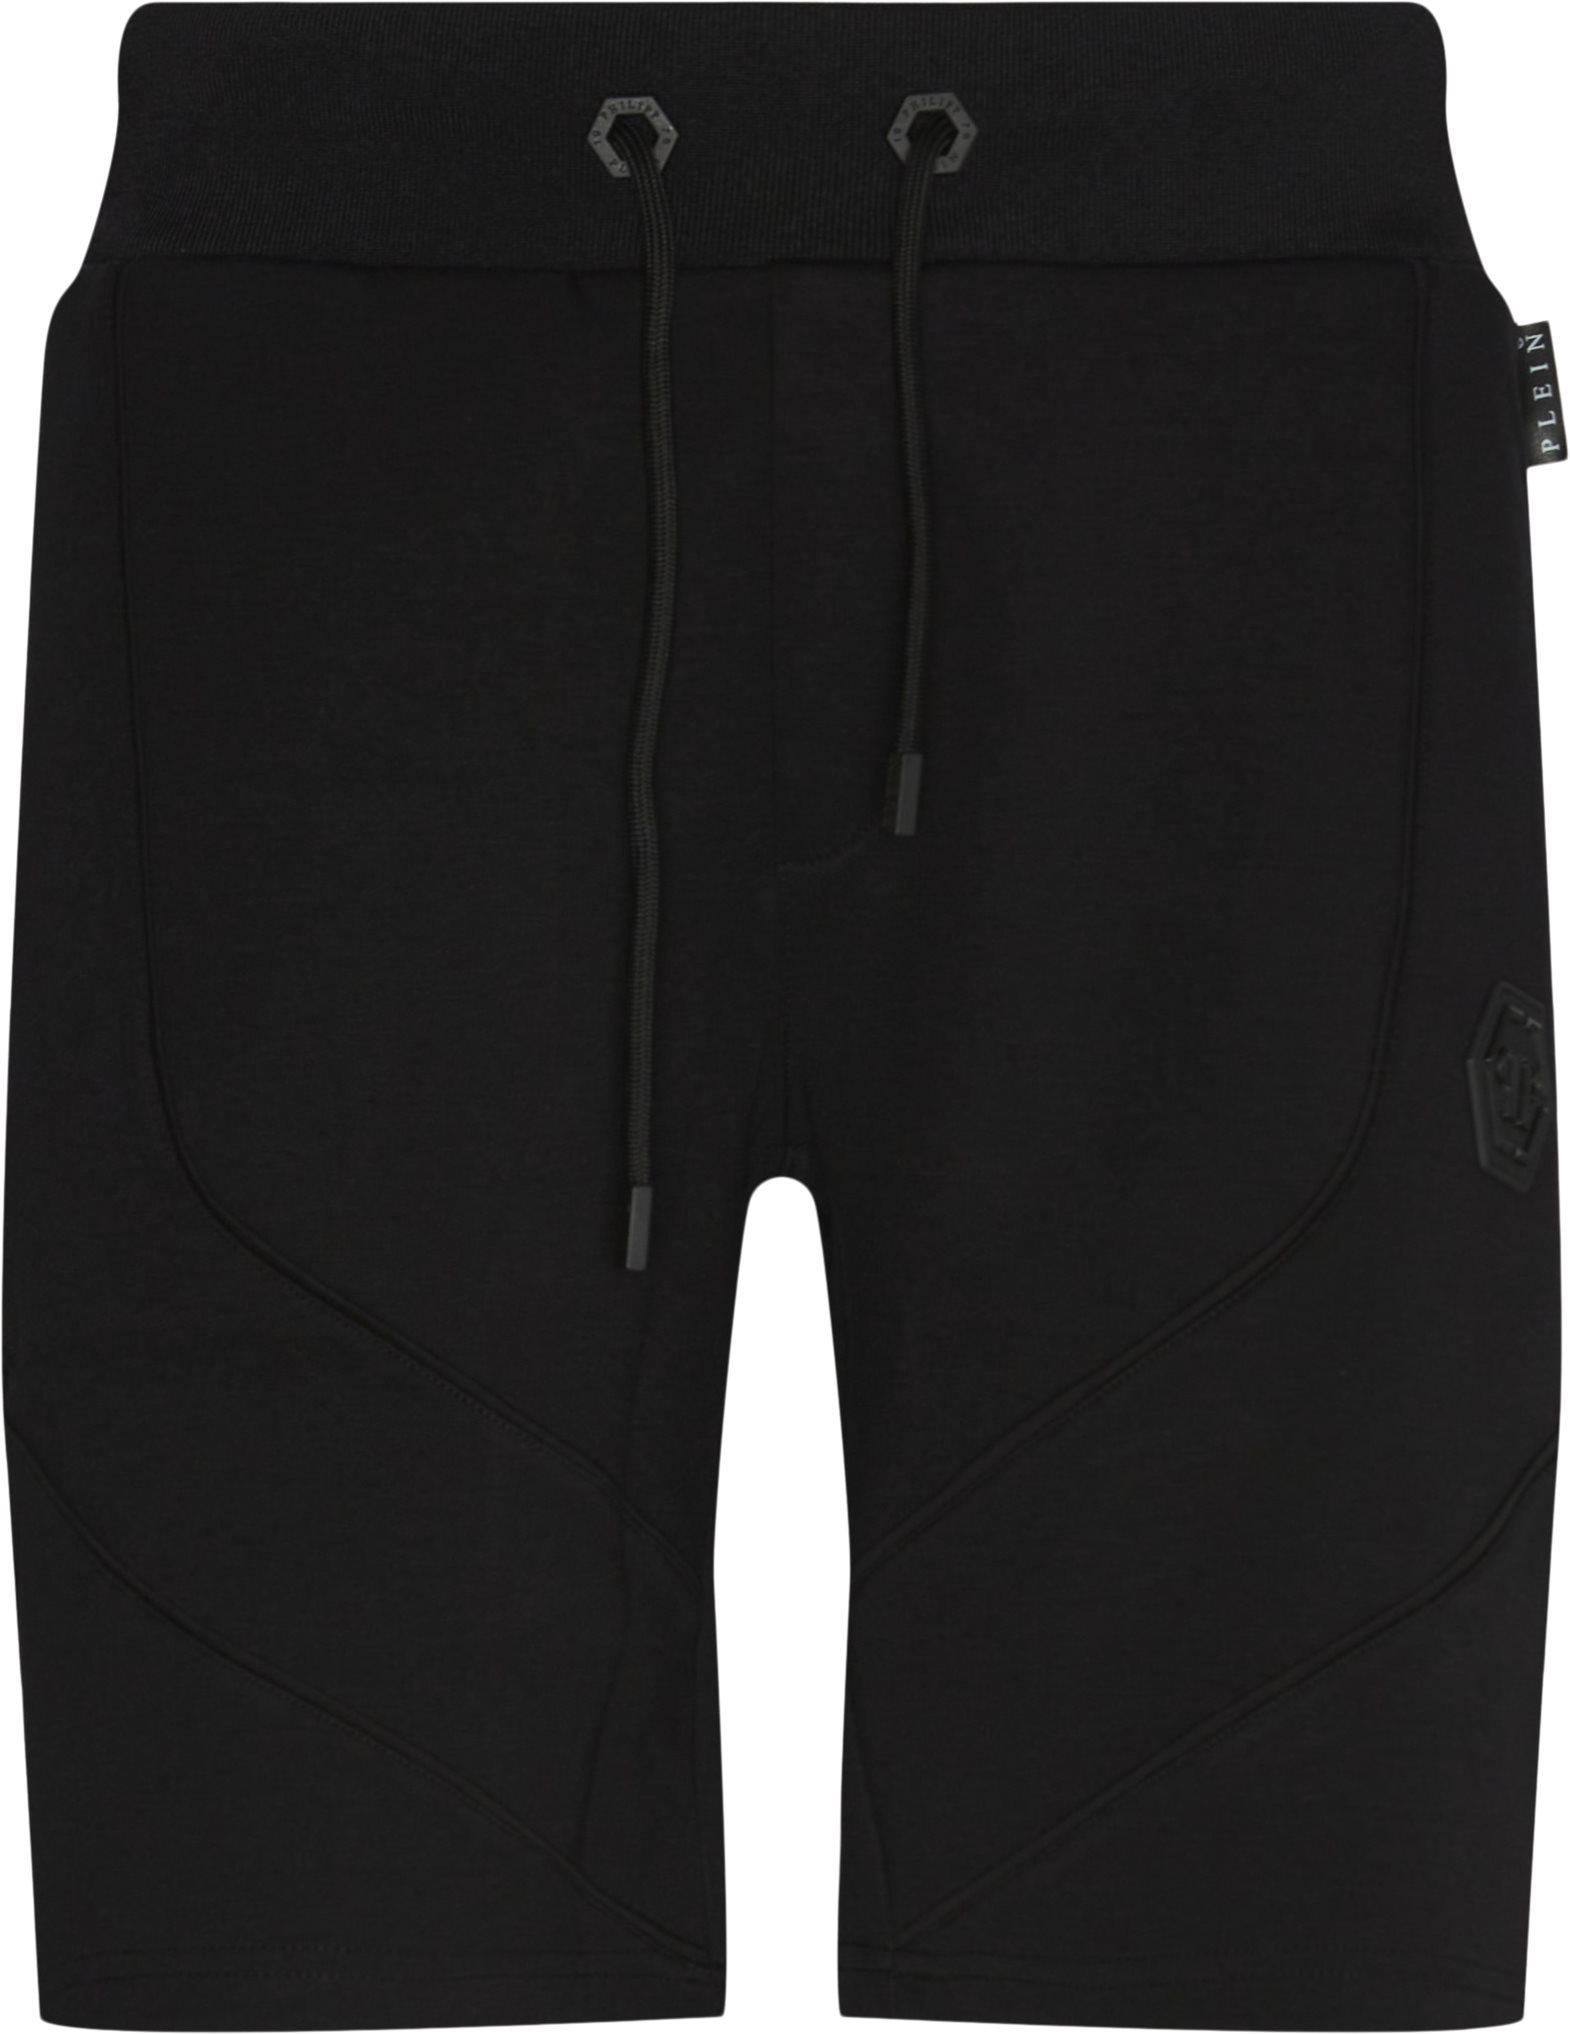 Shorts - Shorts - Regular fit - Sort